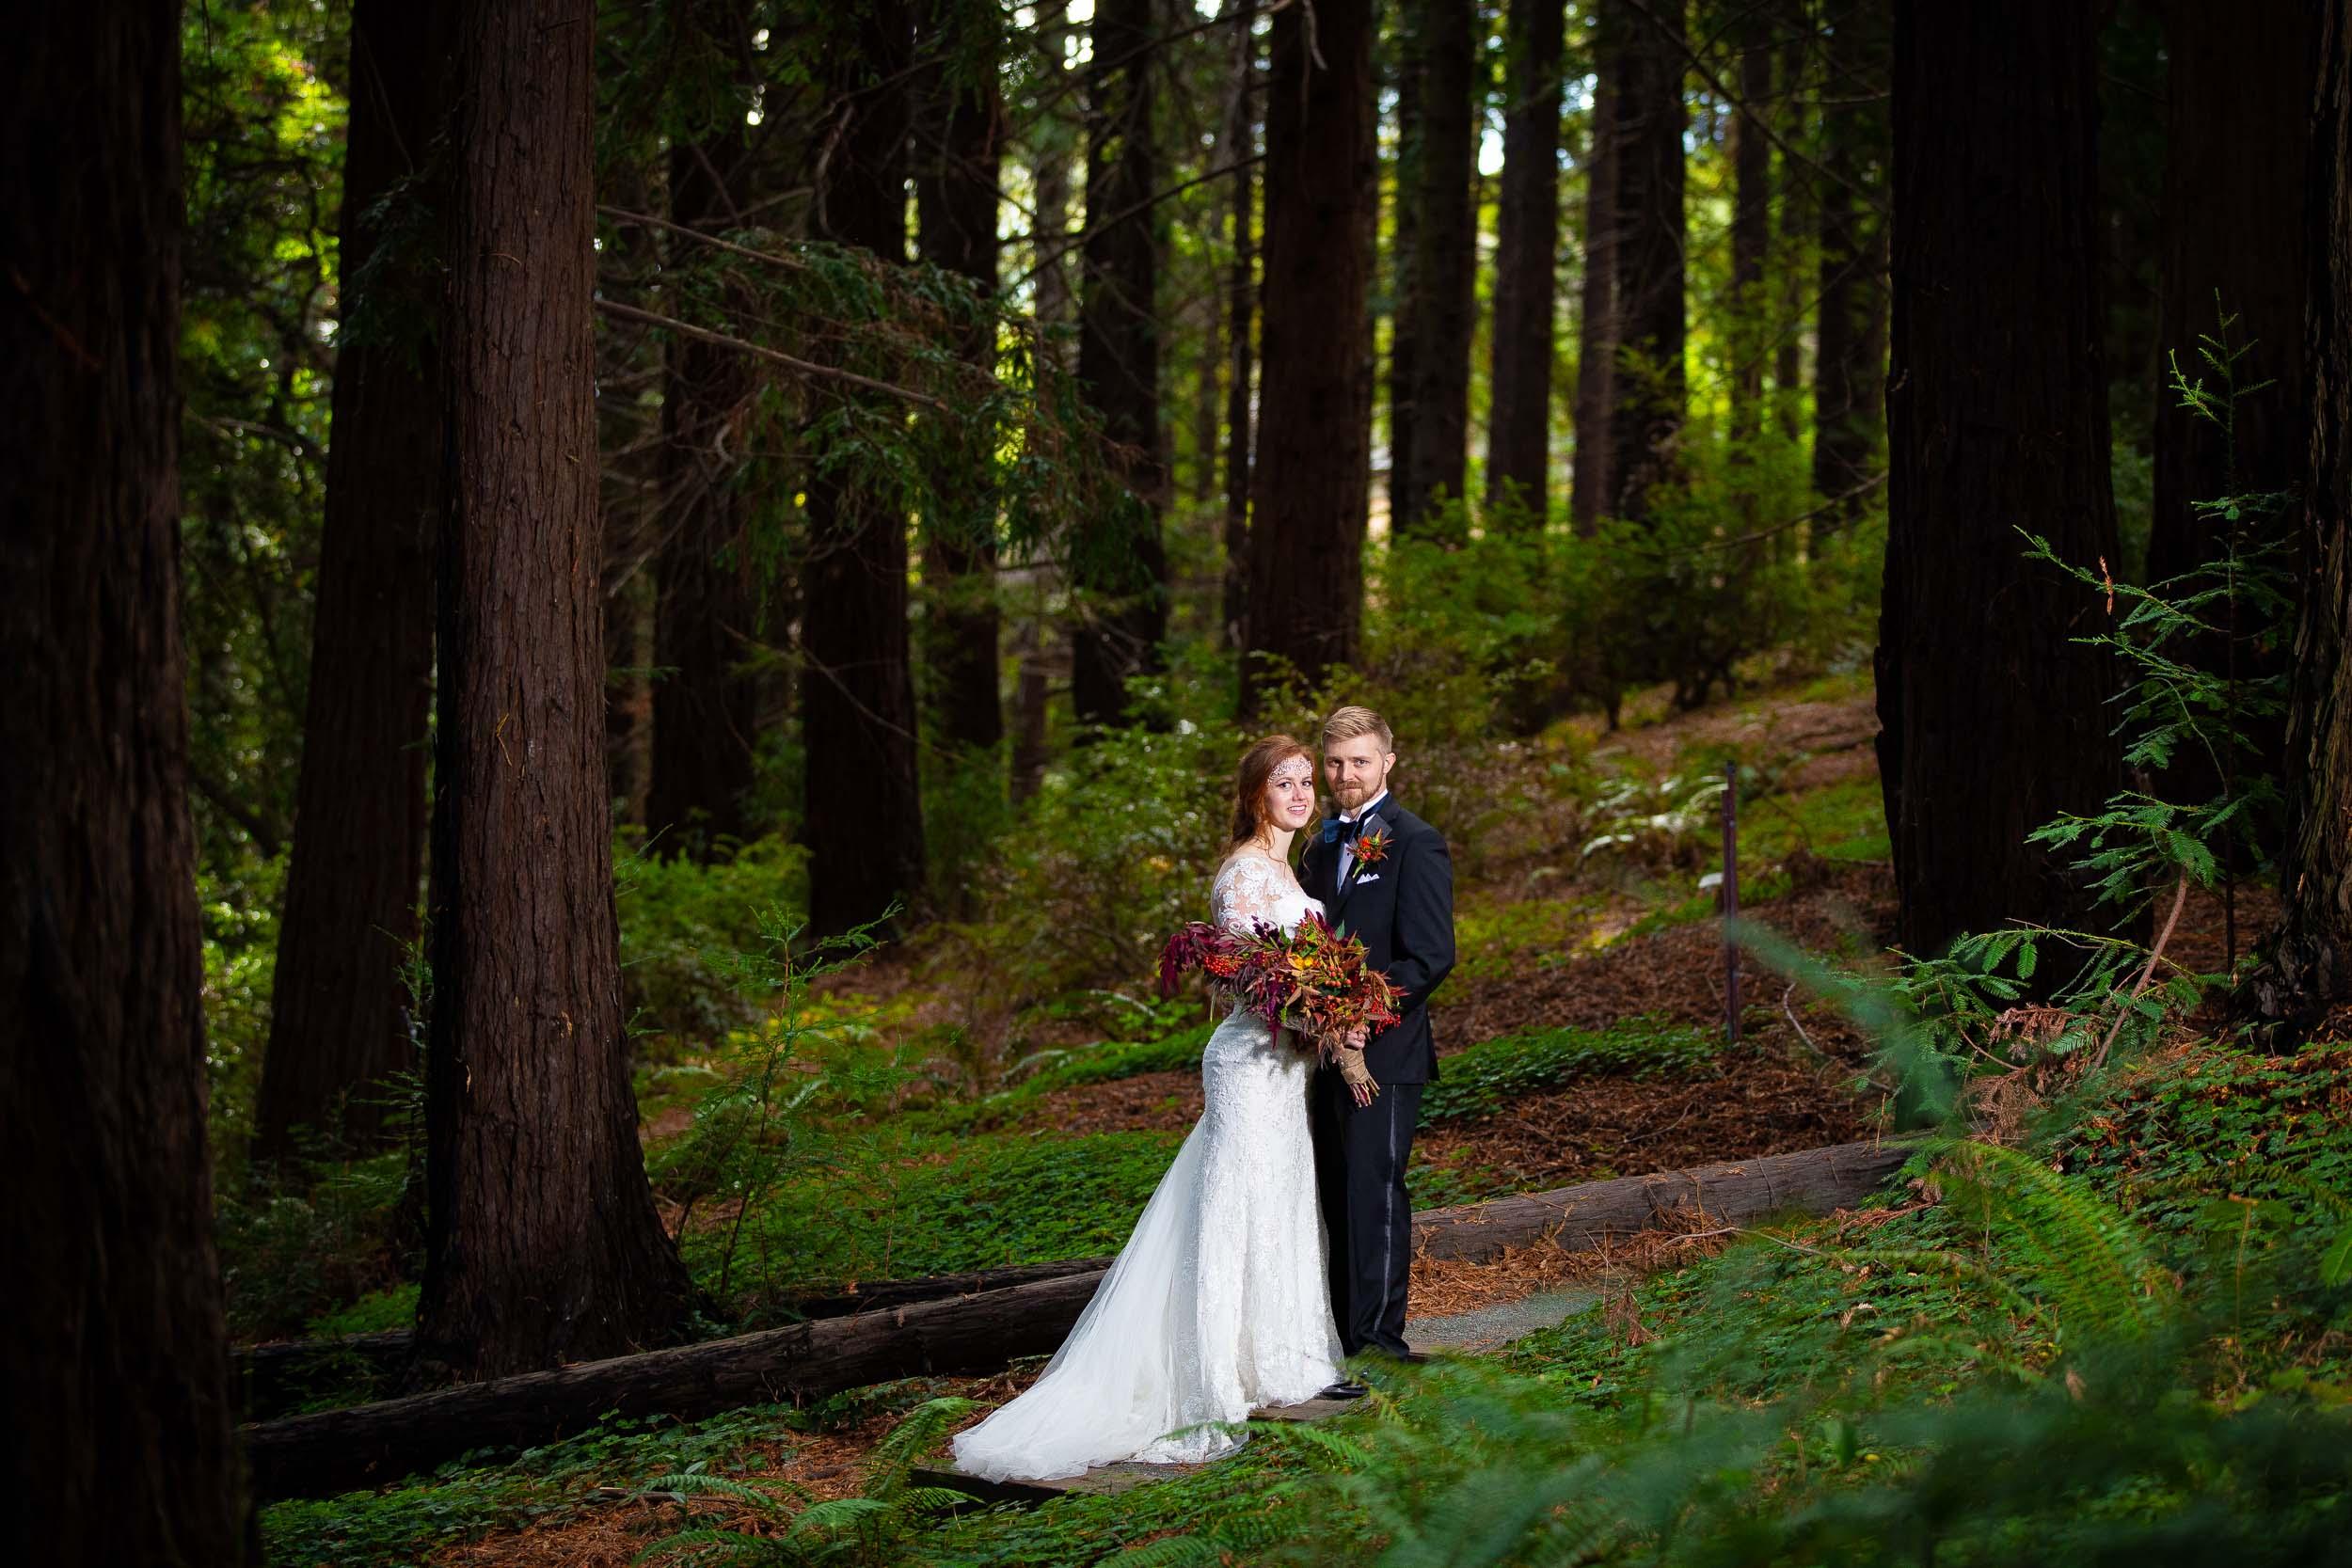 Berkeley Botanical Garden Wedding Ceremony in the Redwood Grove Ceremony and SF Bay Wedding Cruise Reception-51.jpg